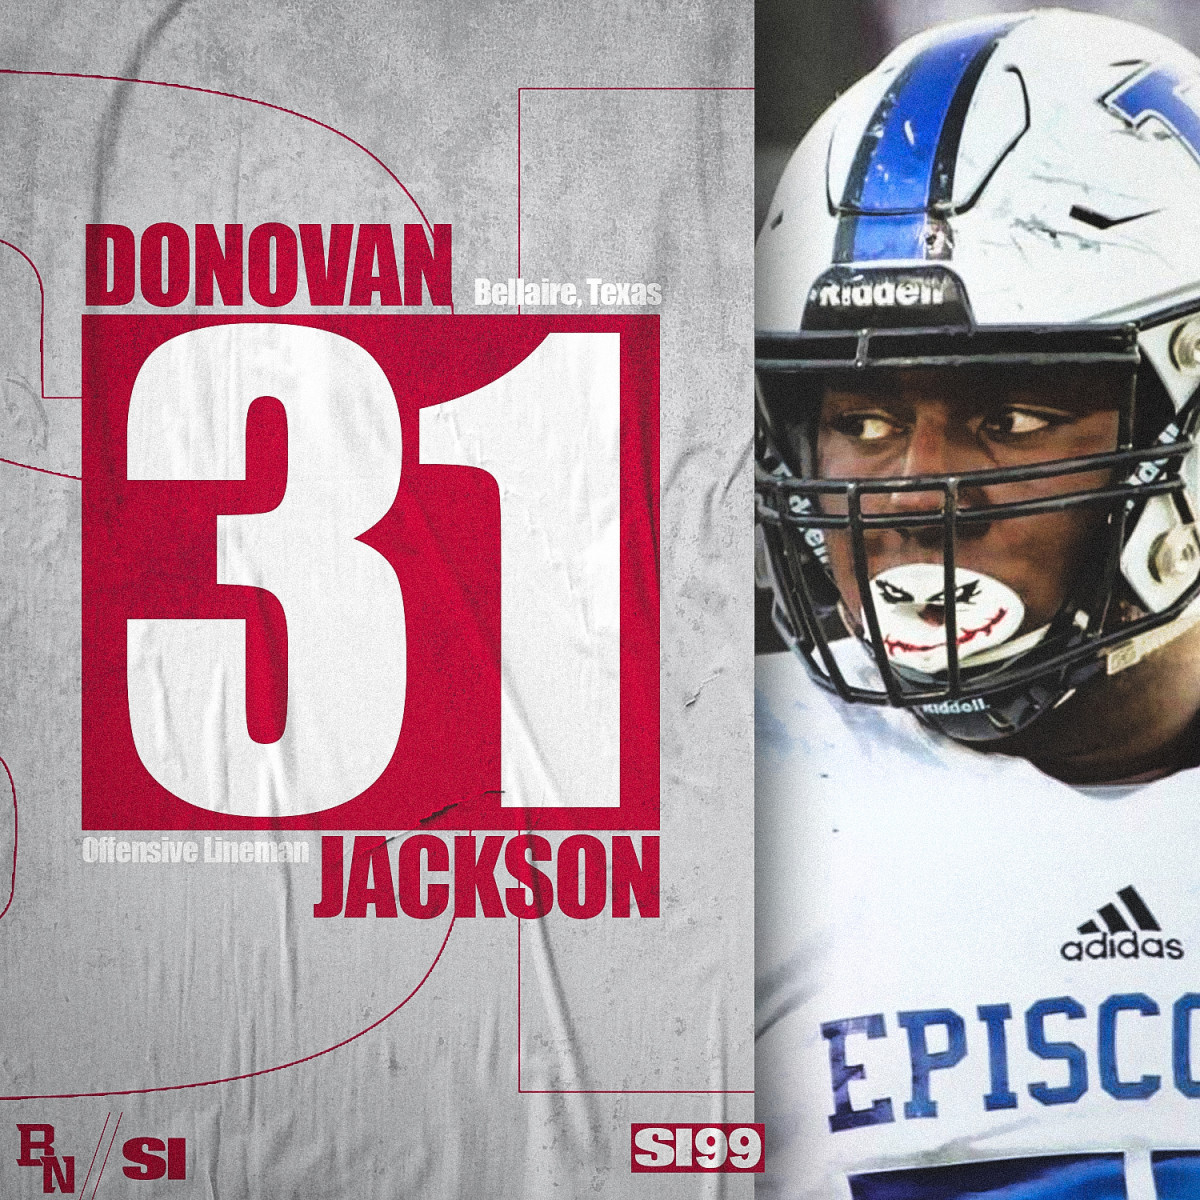 Donovan_Jackson